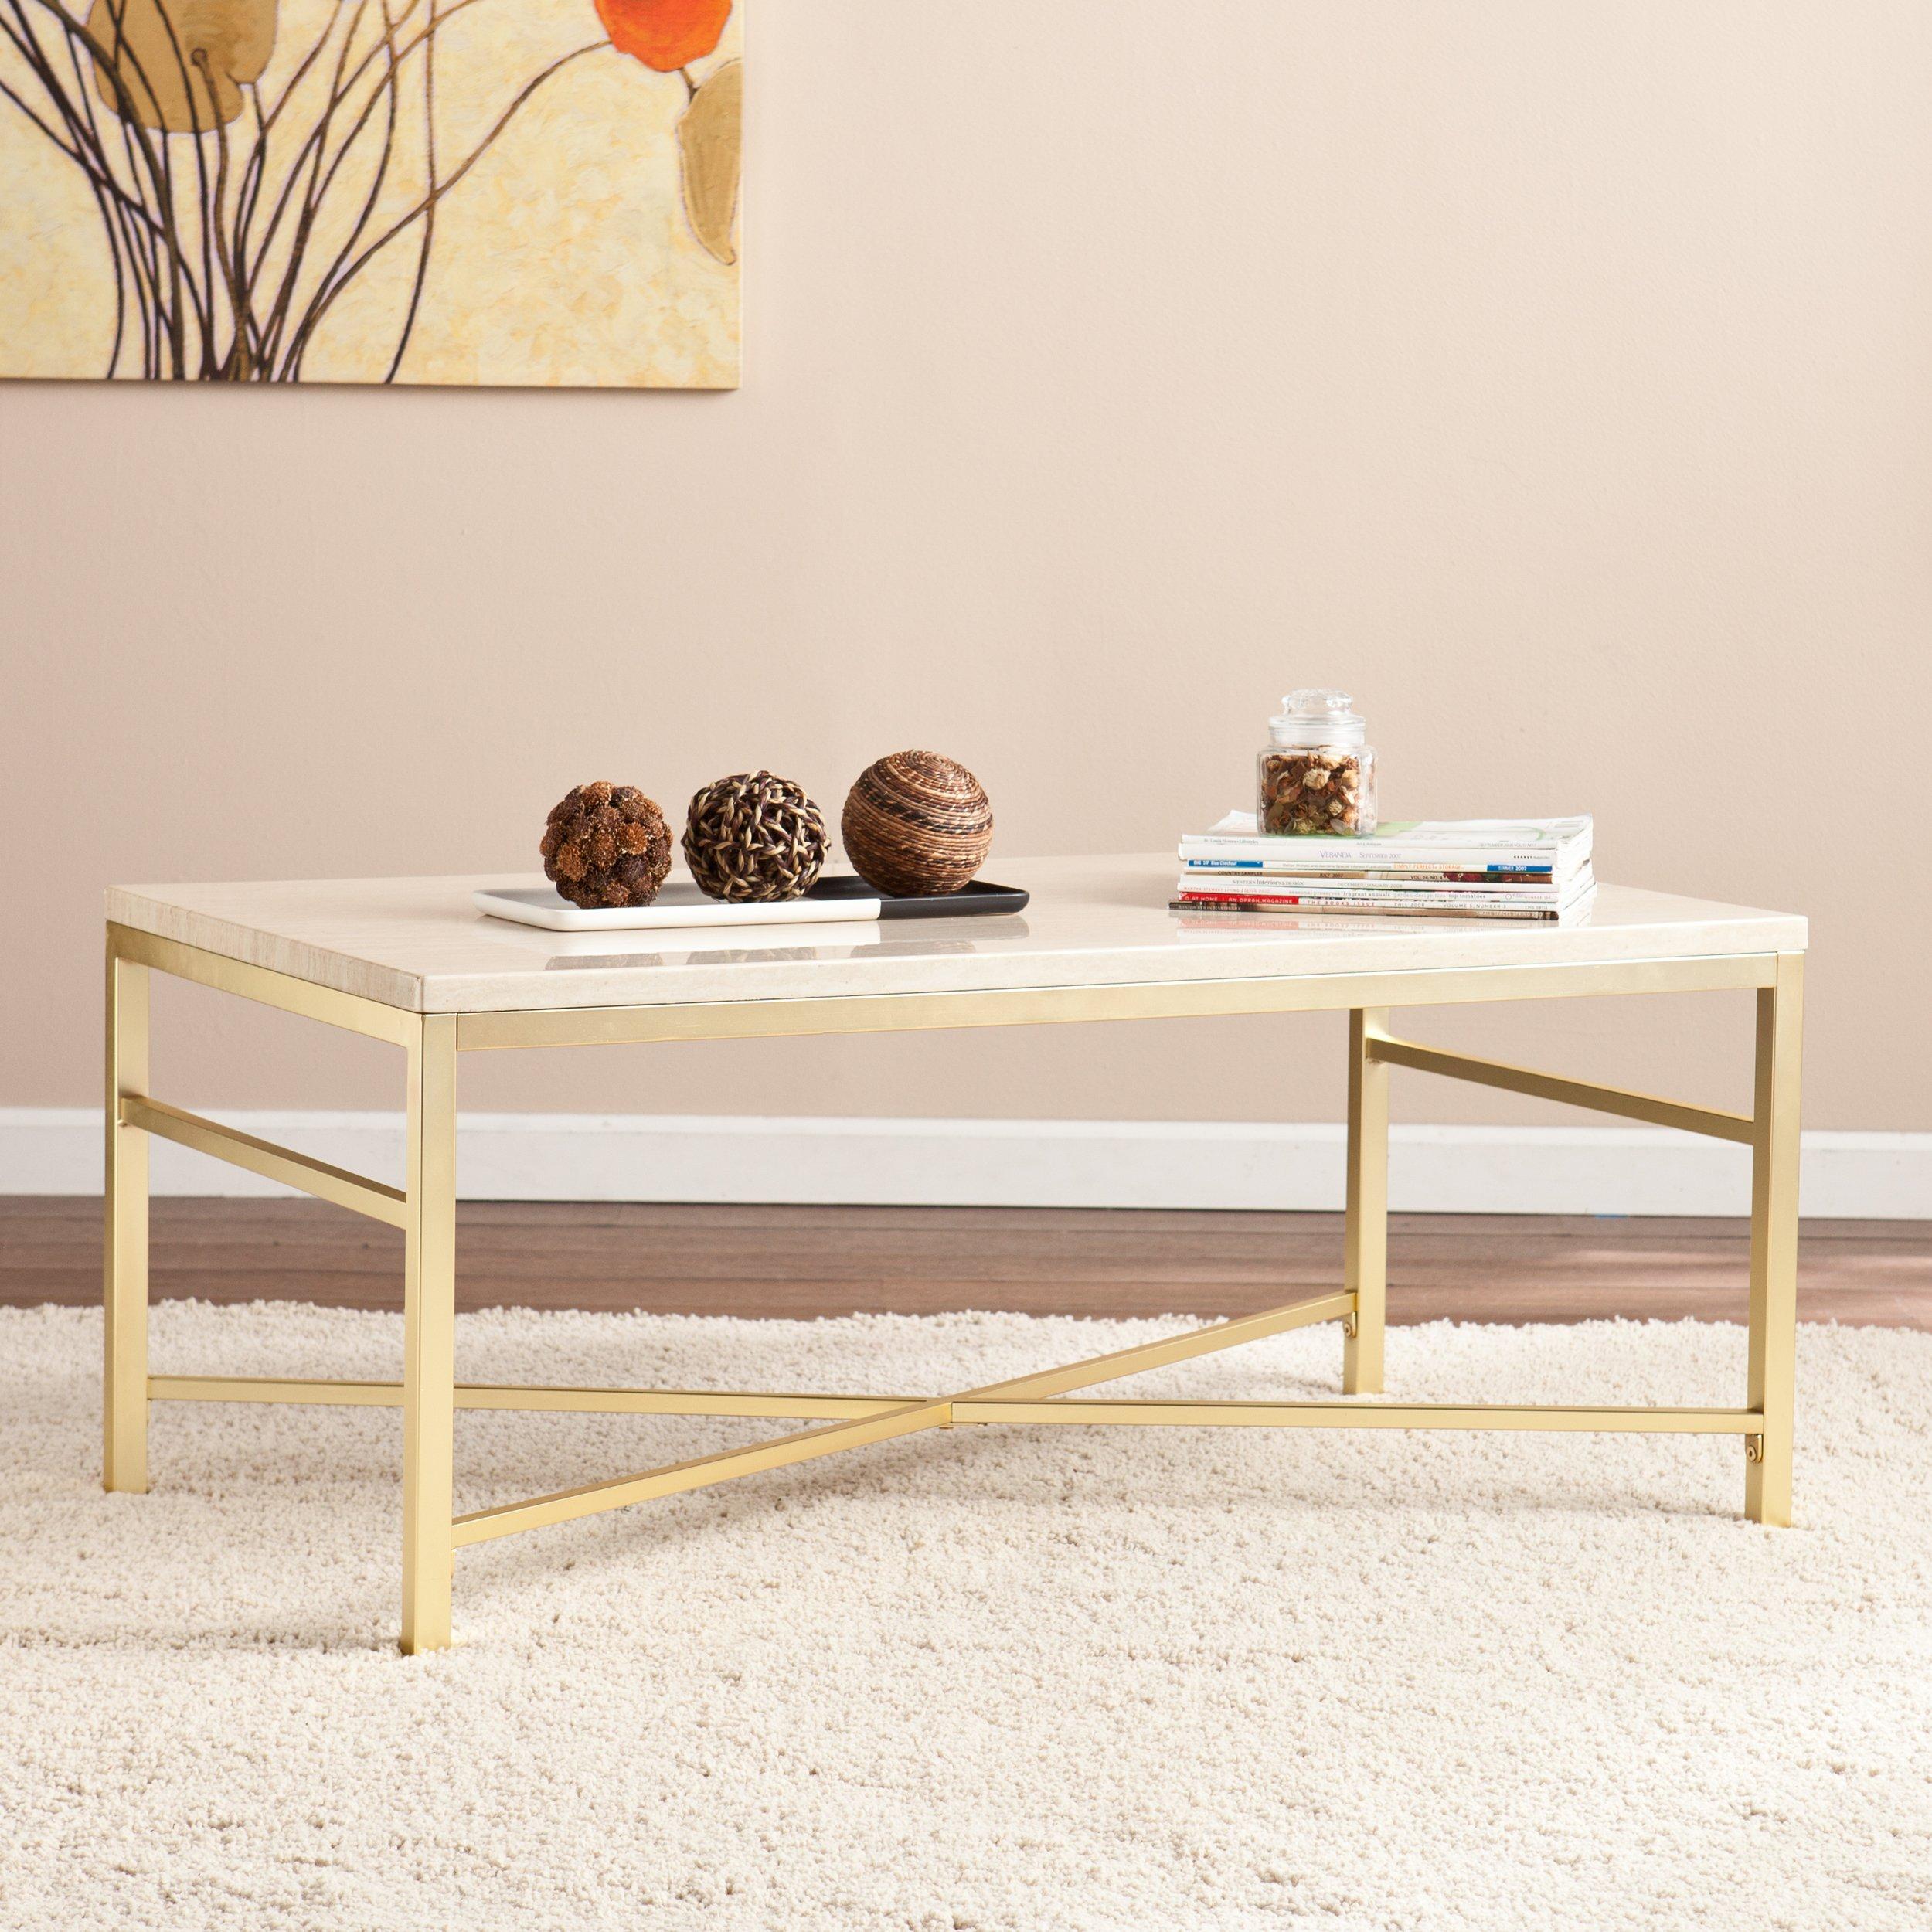 Orinda Faux Stone Cocktail Table - Matte Brass Metal Frame - Chic Design by Southern Enterprises